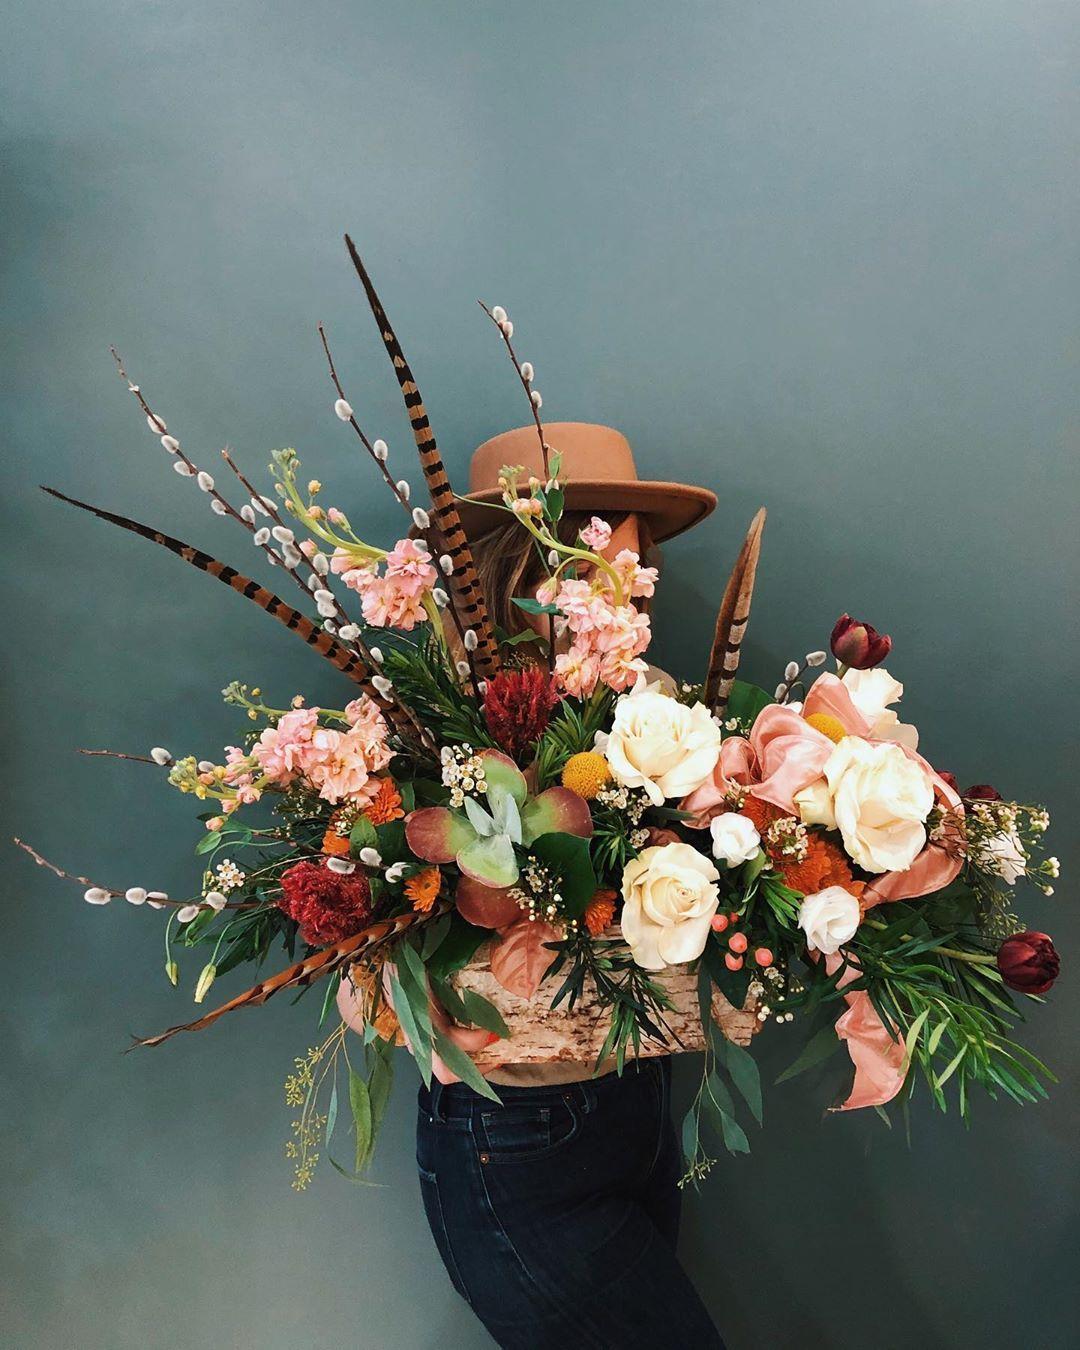 Melanie Ciarallo On Instagram 異体同心 Two Bodies One Heart Love To Celebrate Love Made This For Friends Wedd Friend Wedding Wedding Anniversary Wedding